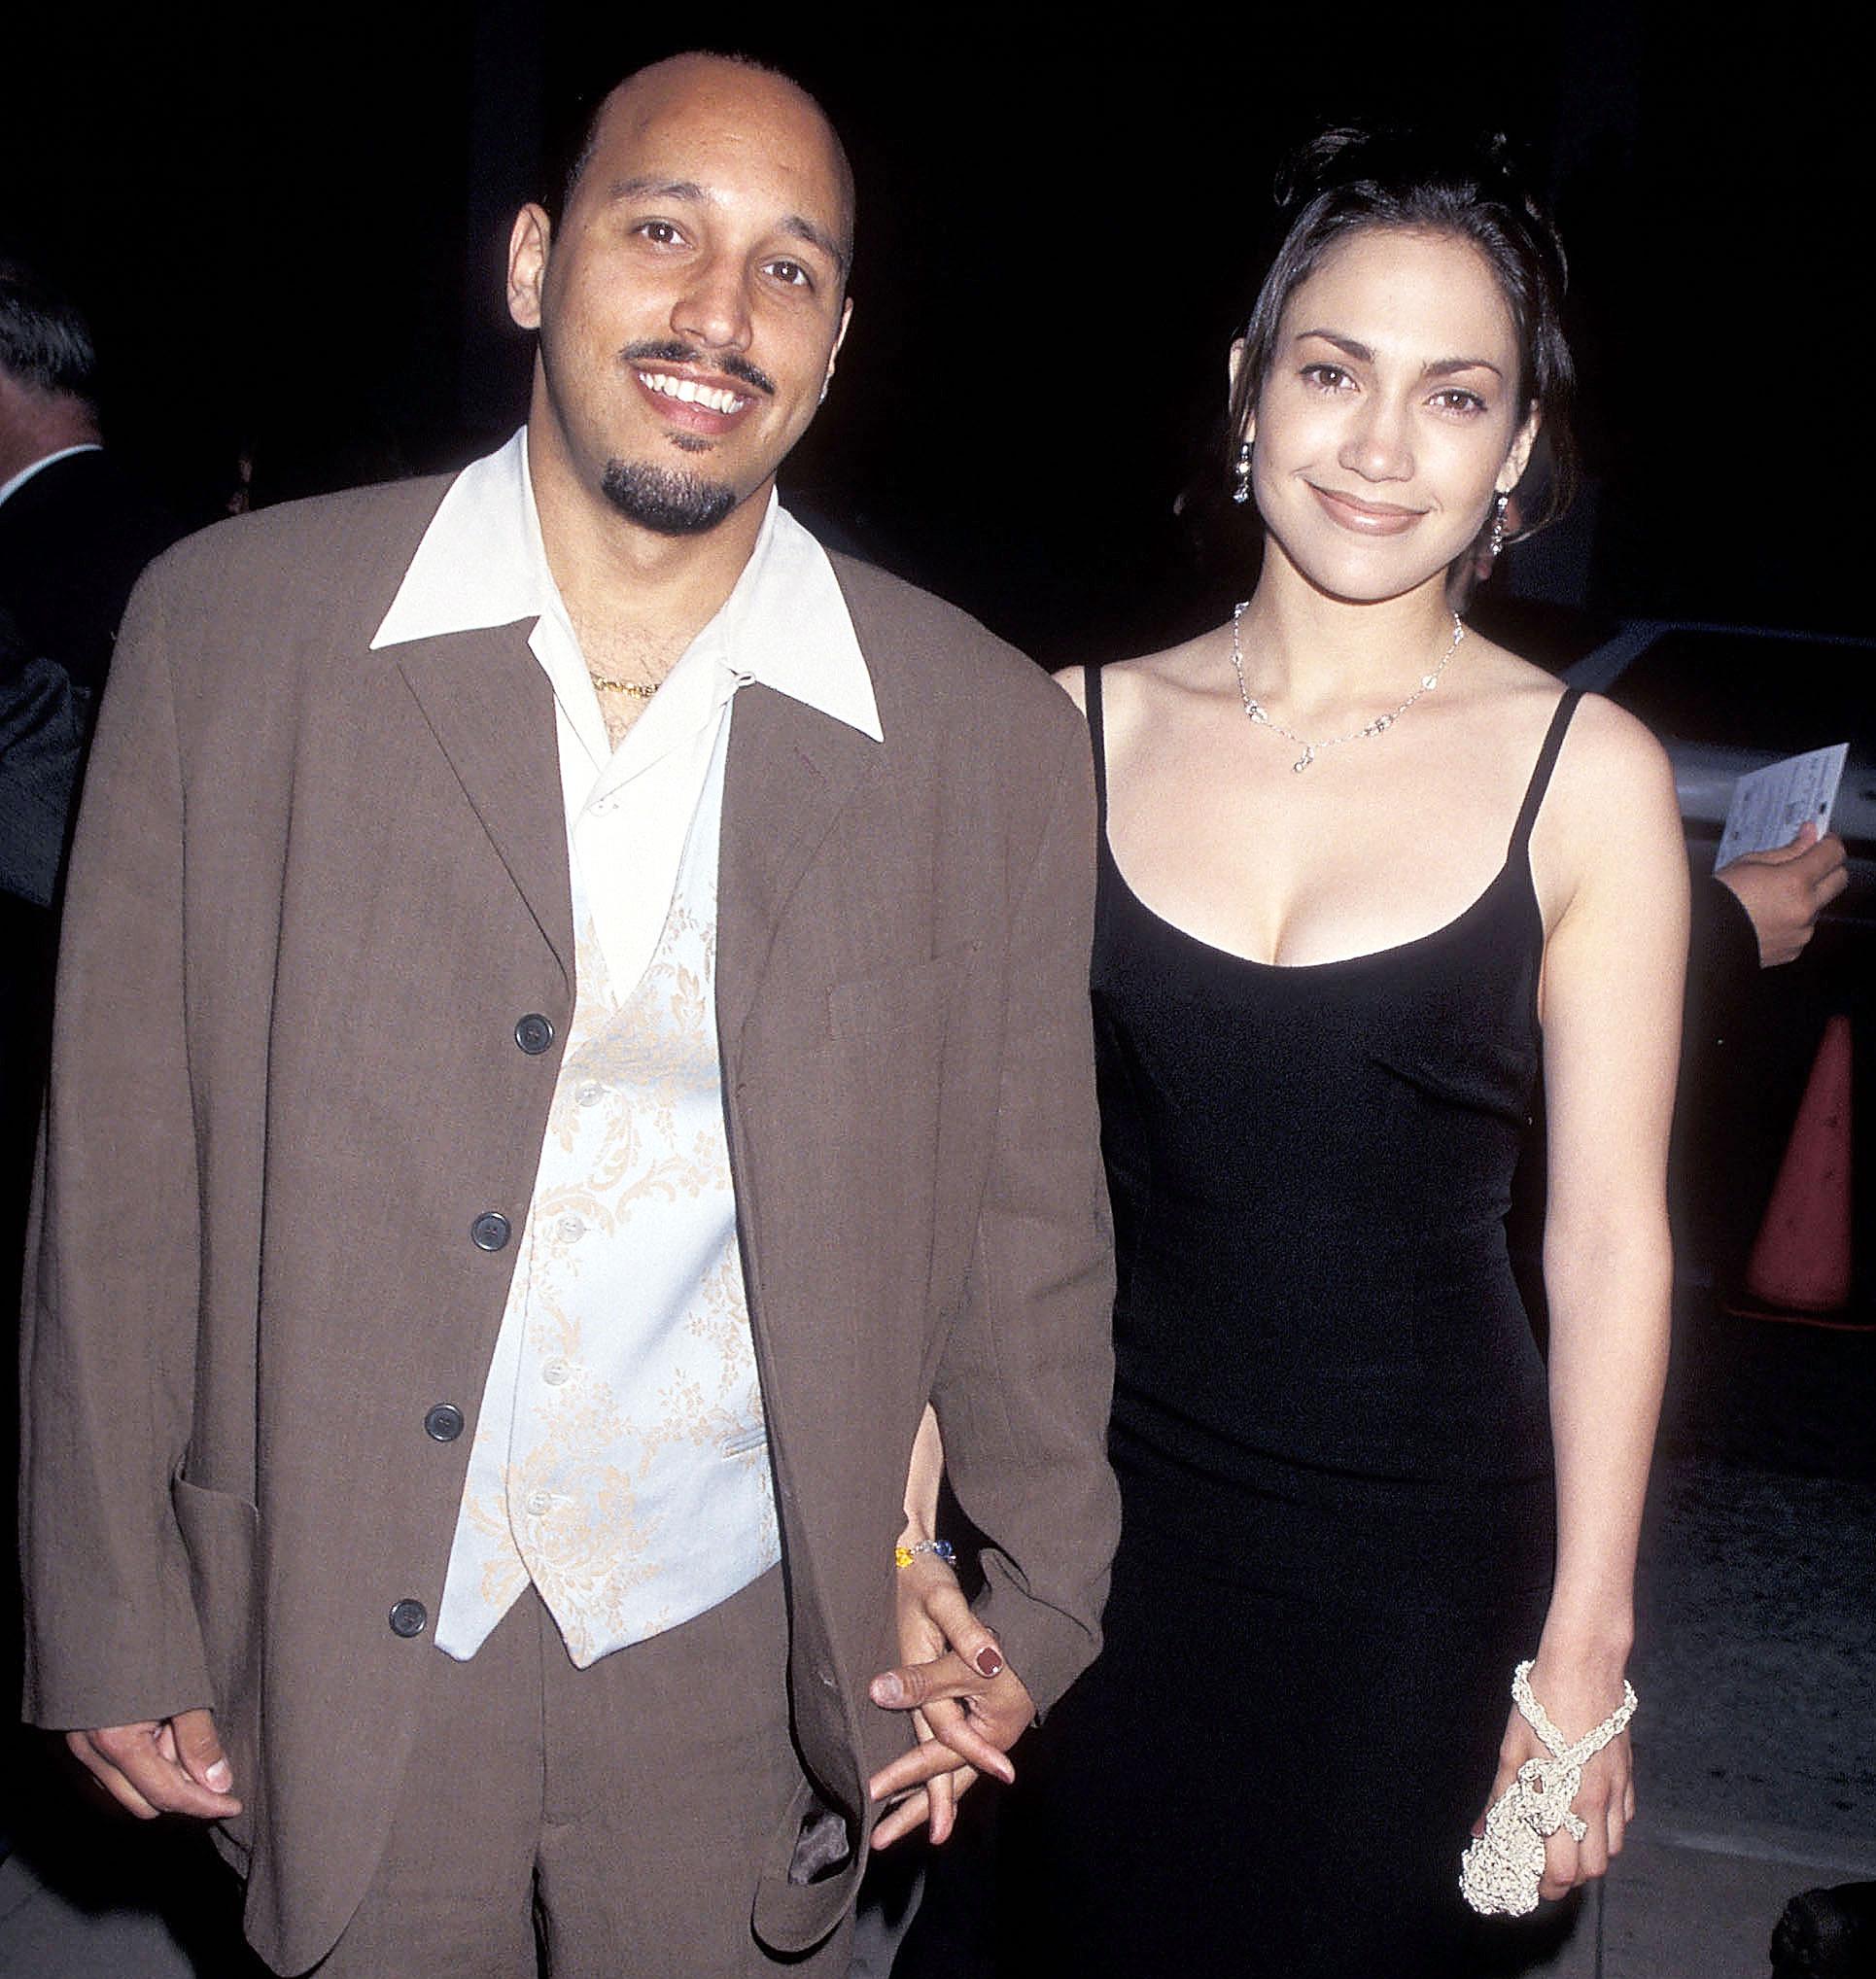 Jennifer Lopezs High School Boyfriend David Cruz Dead at Age 51